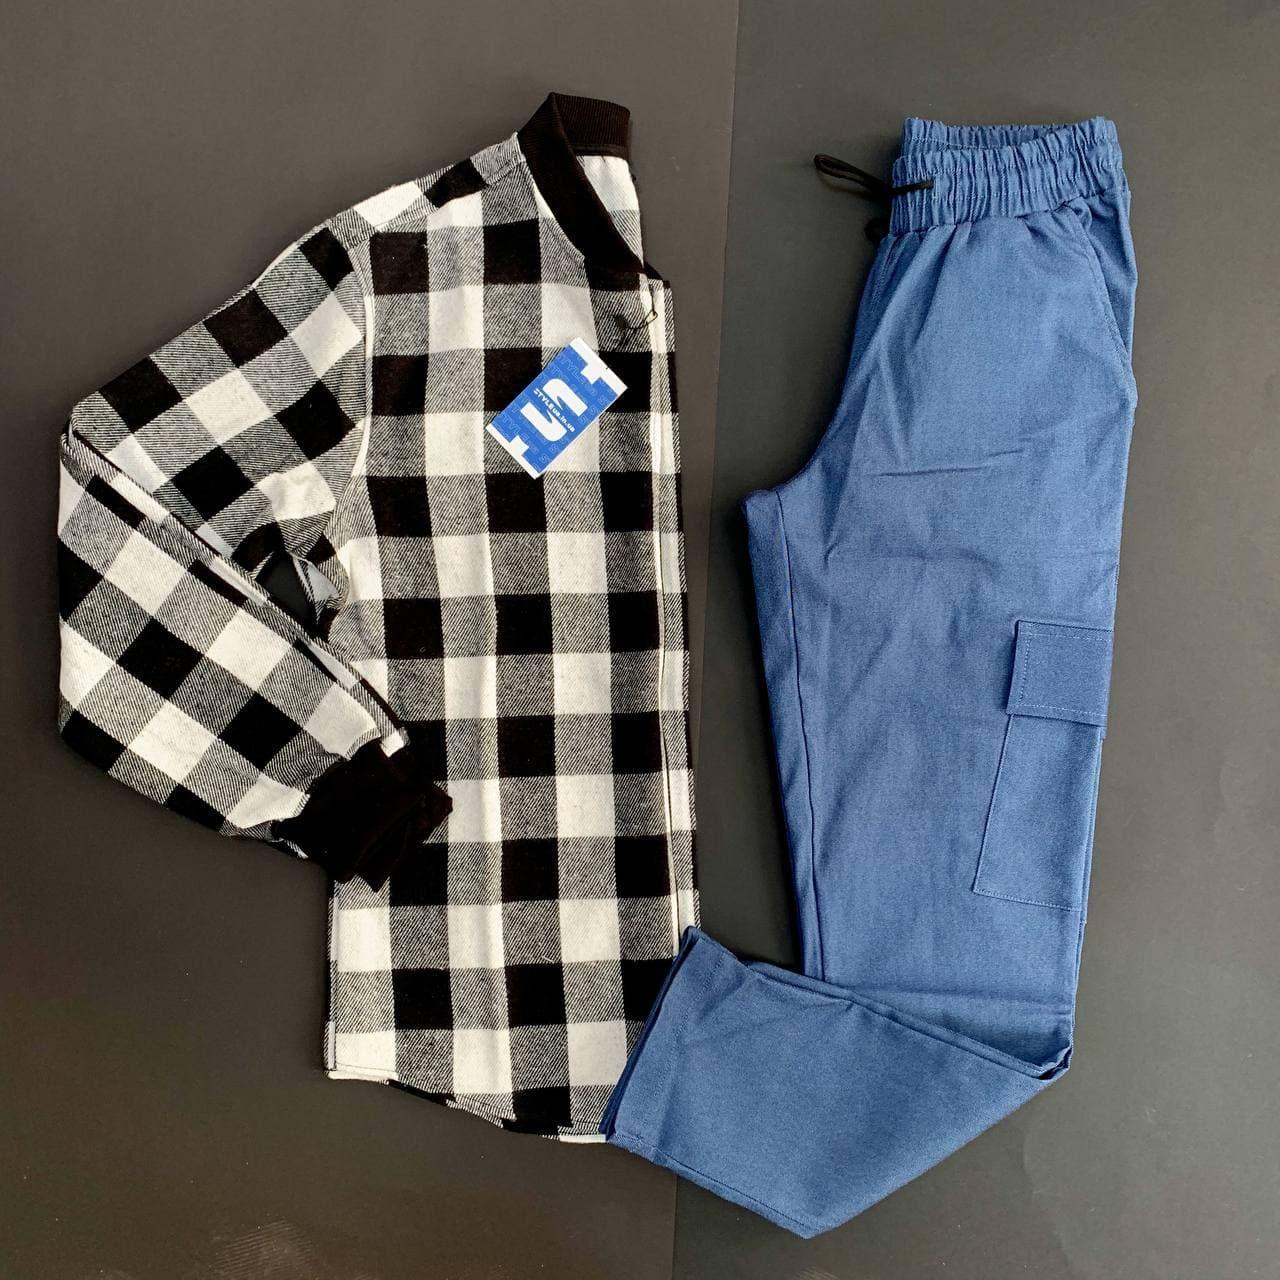 Мужской комплект Рубашка-бомбер клетчатая на молнии + Штаны карго синие на шнурке демисезон